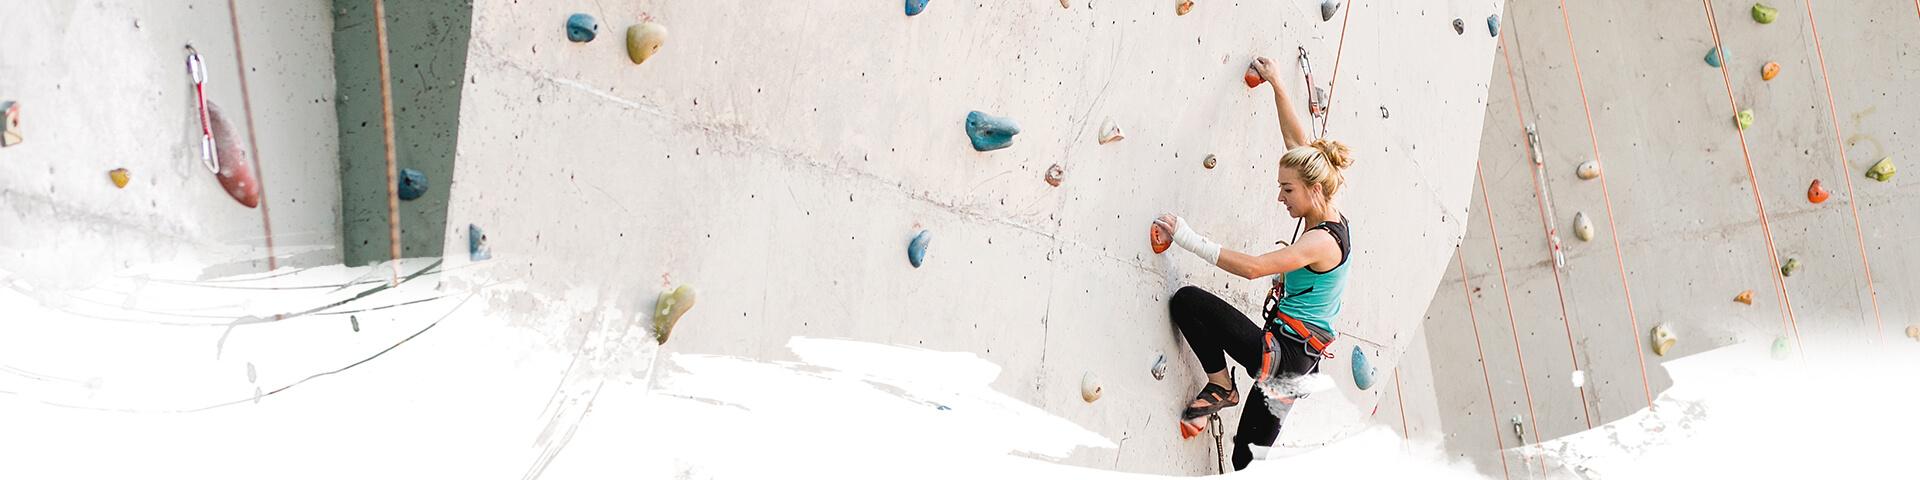 MAXIM ropes for Gym climbing